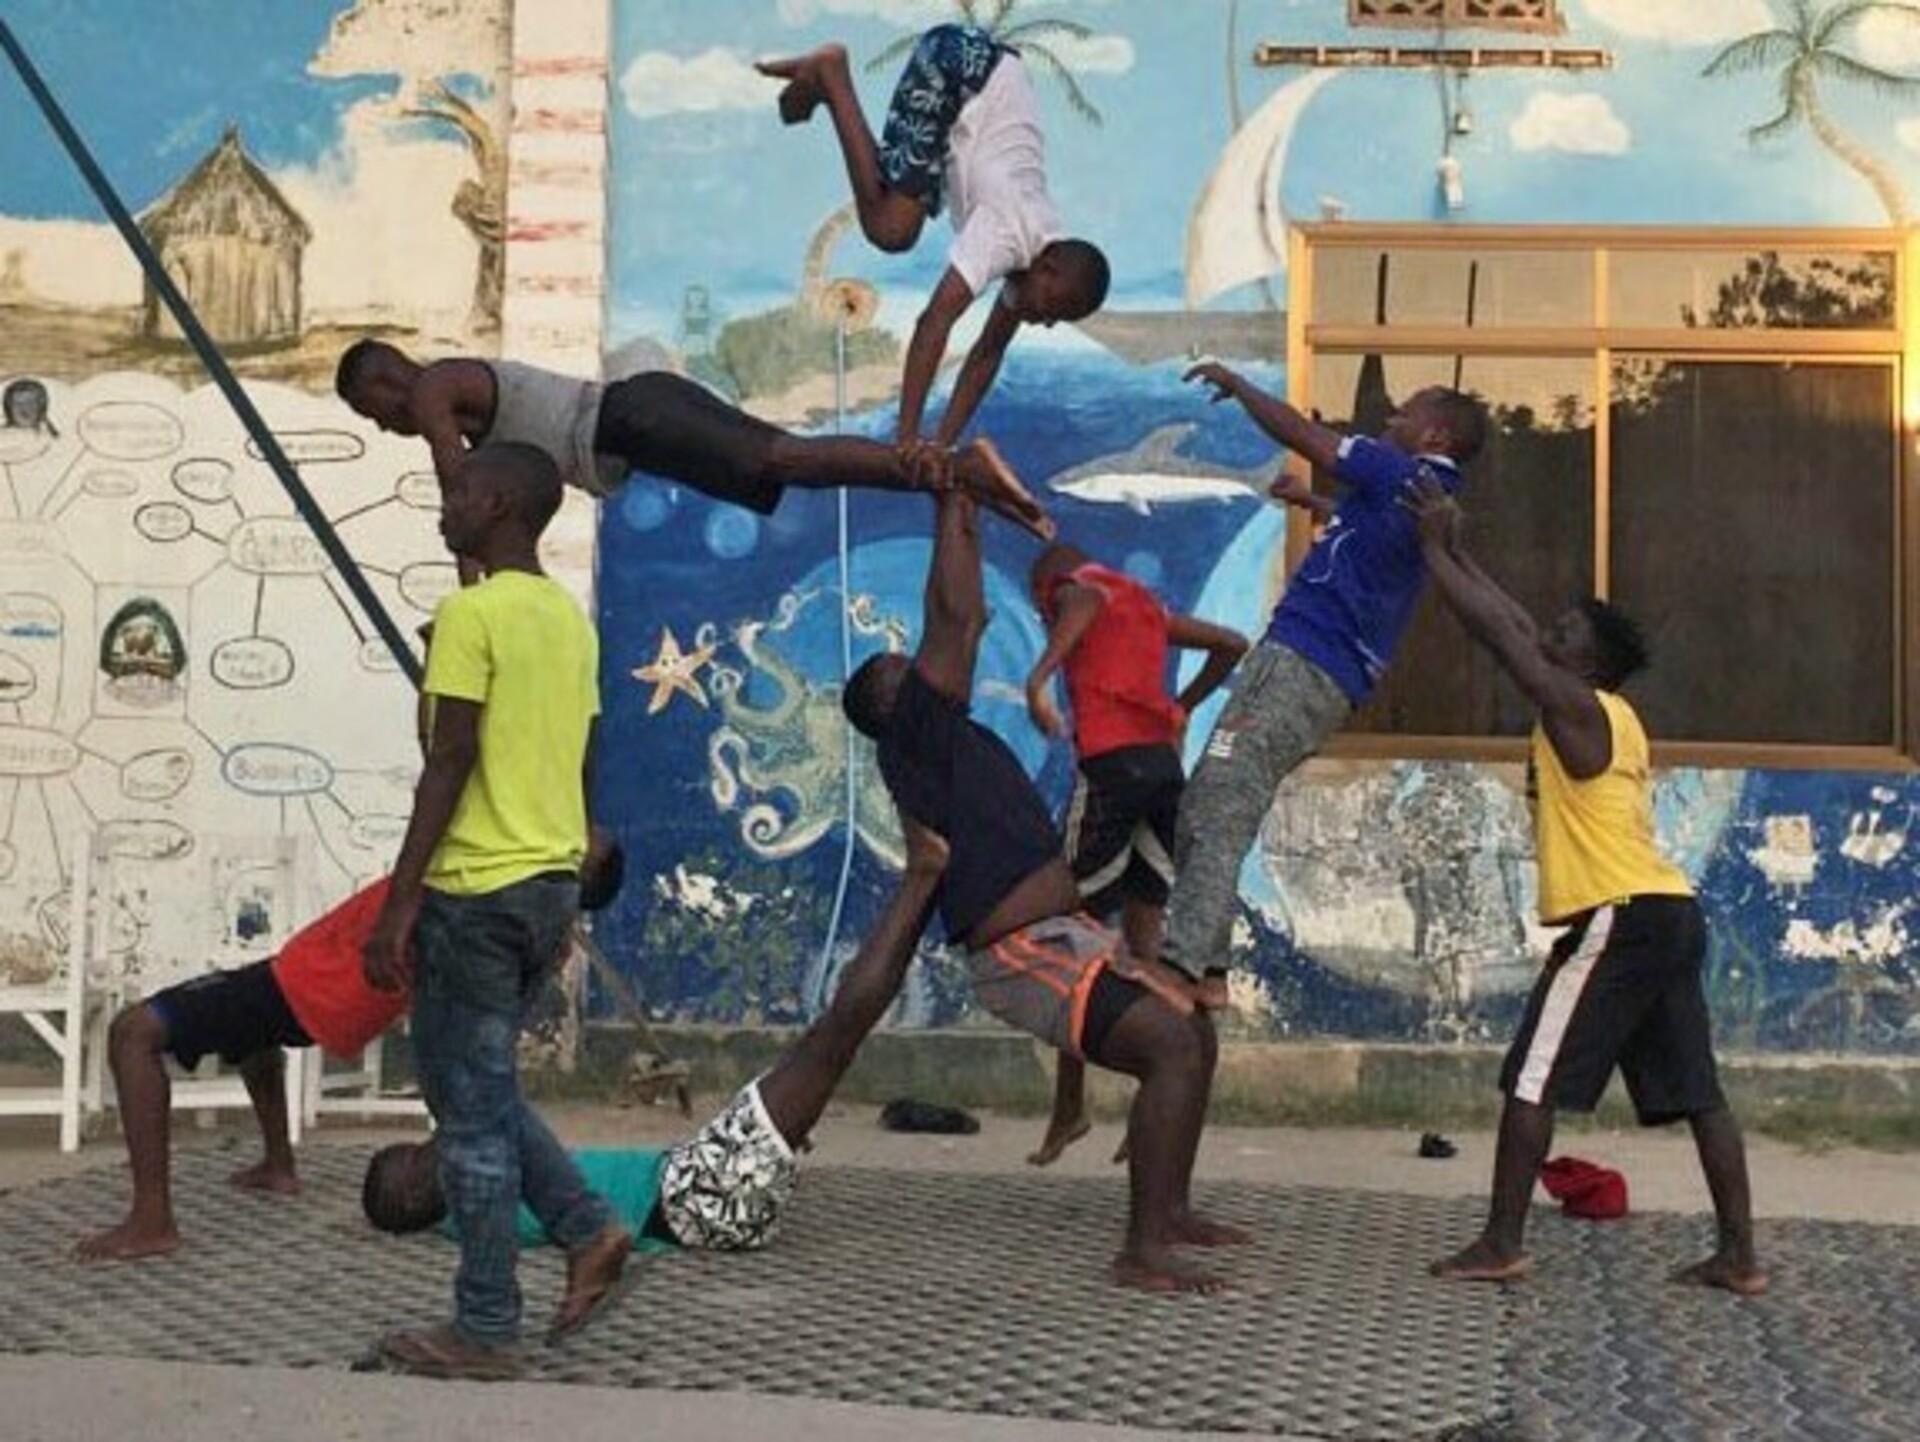 ODI Freiwilligendienst Tansania Akrobatik